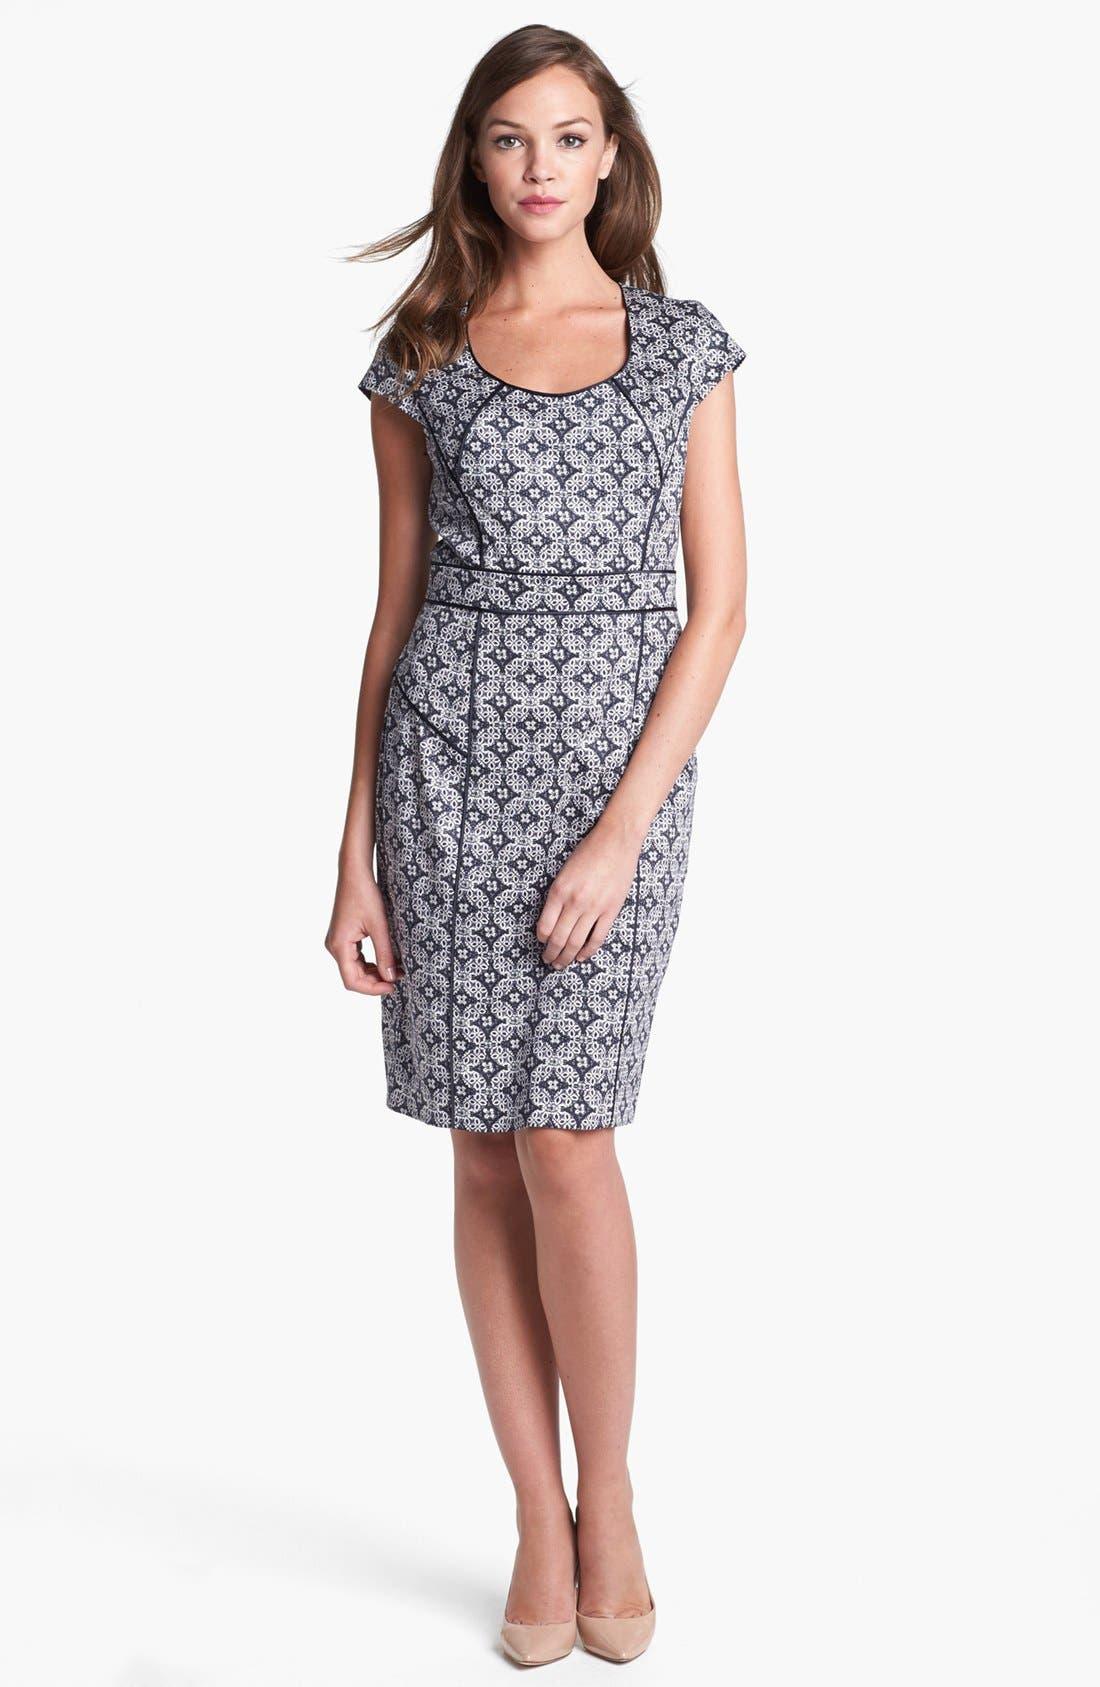 Alternate Image 1 Selected - Adrianna Papell Mosaic Print Dress